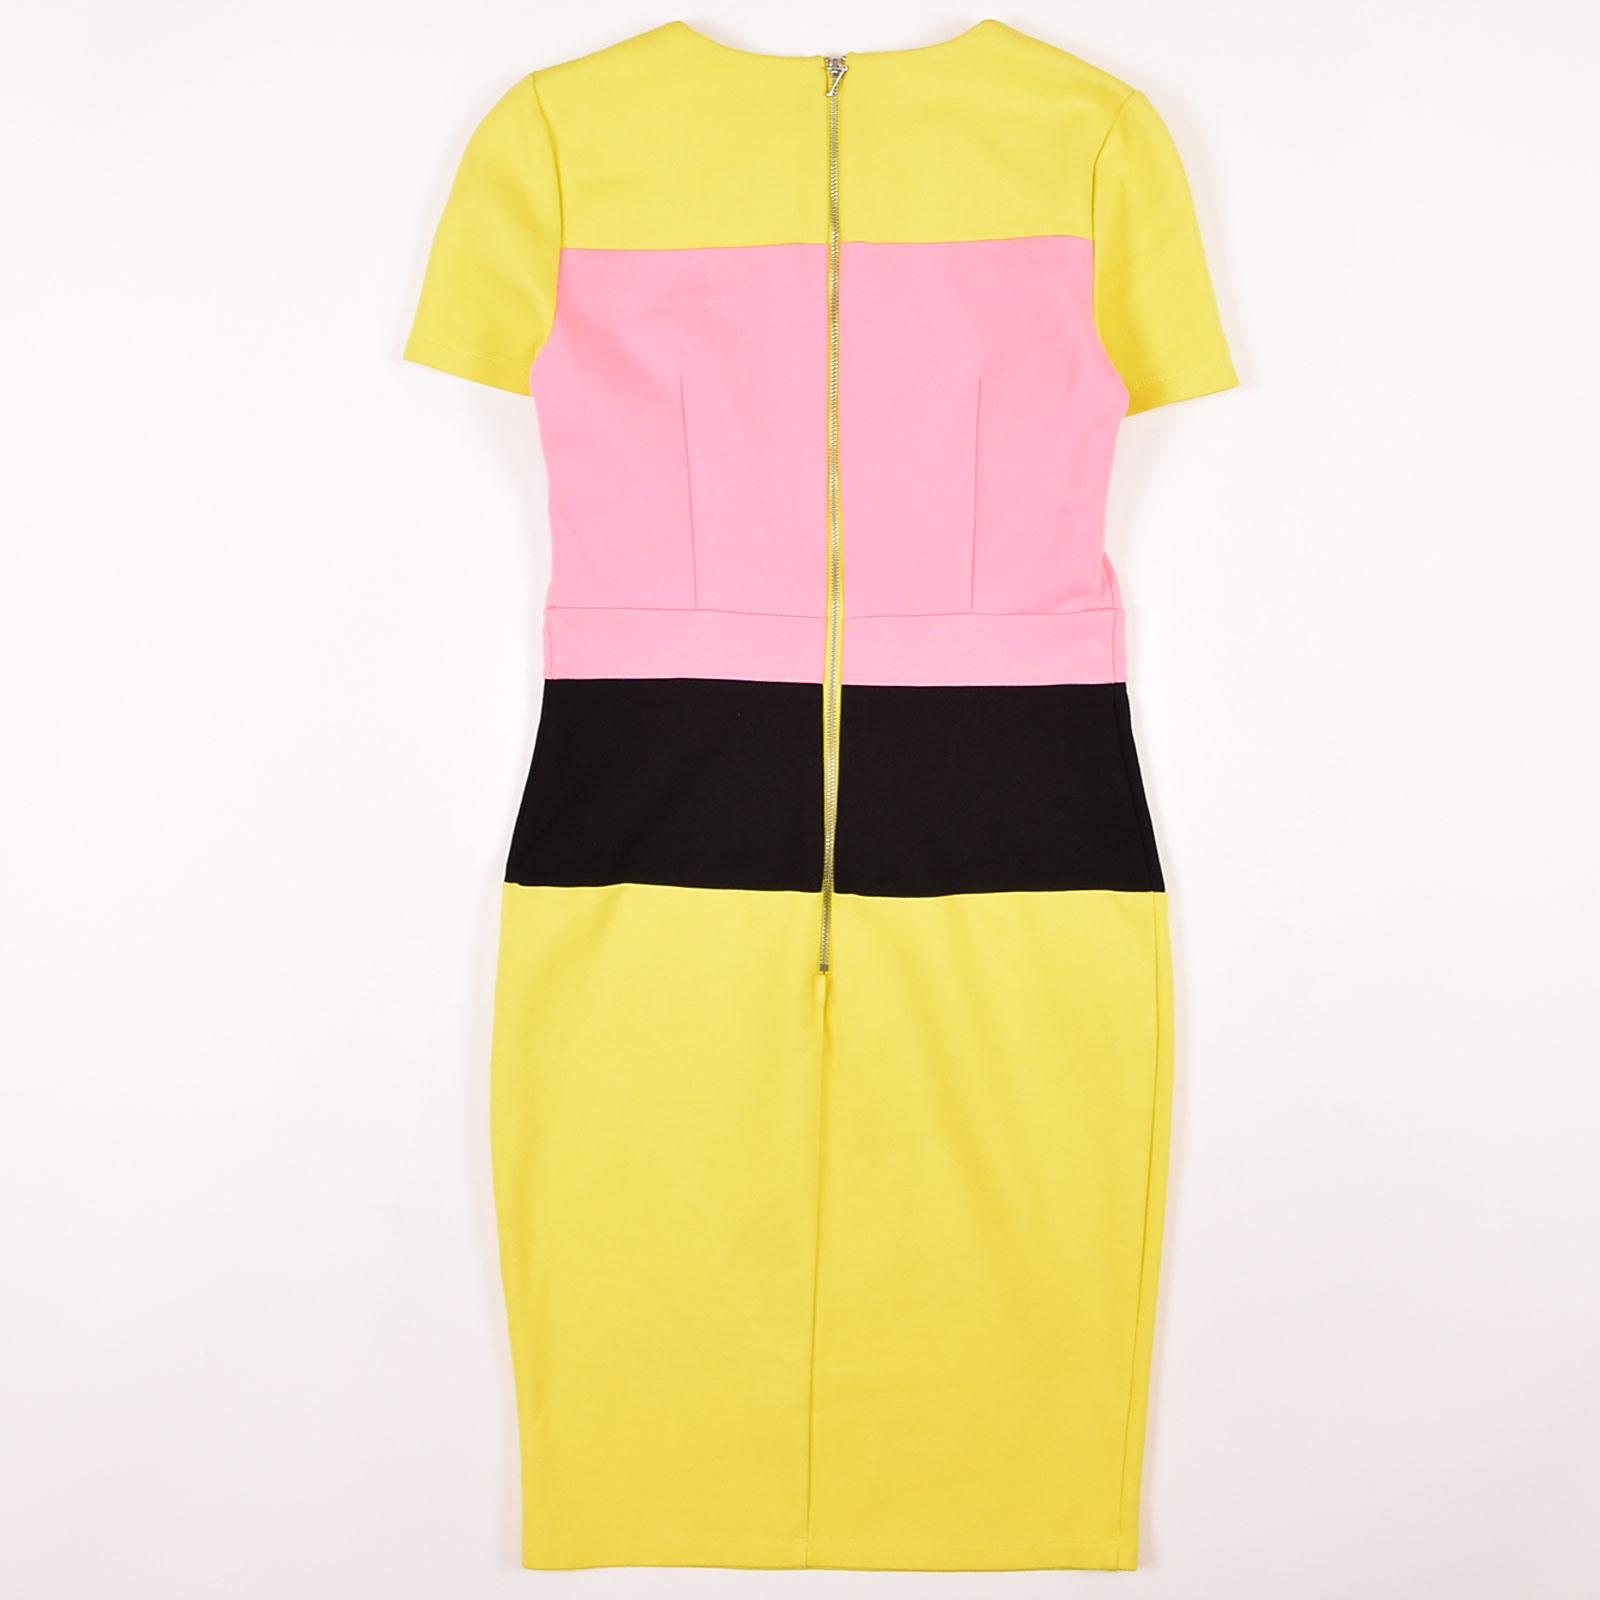 French Connection Damen Kleid Dress Etuikleid Gr38